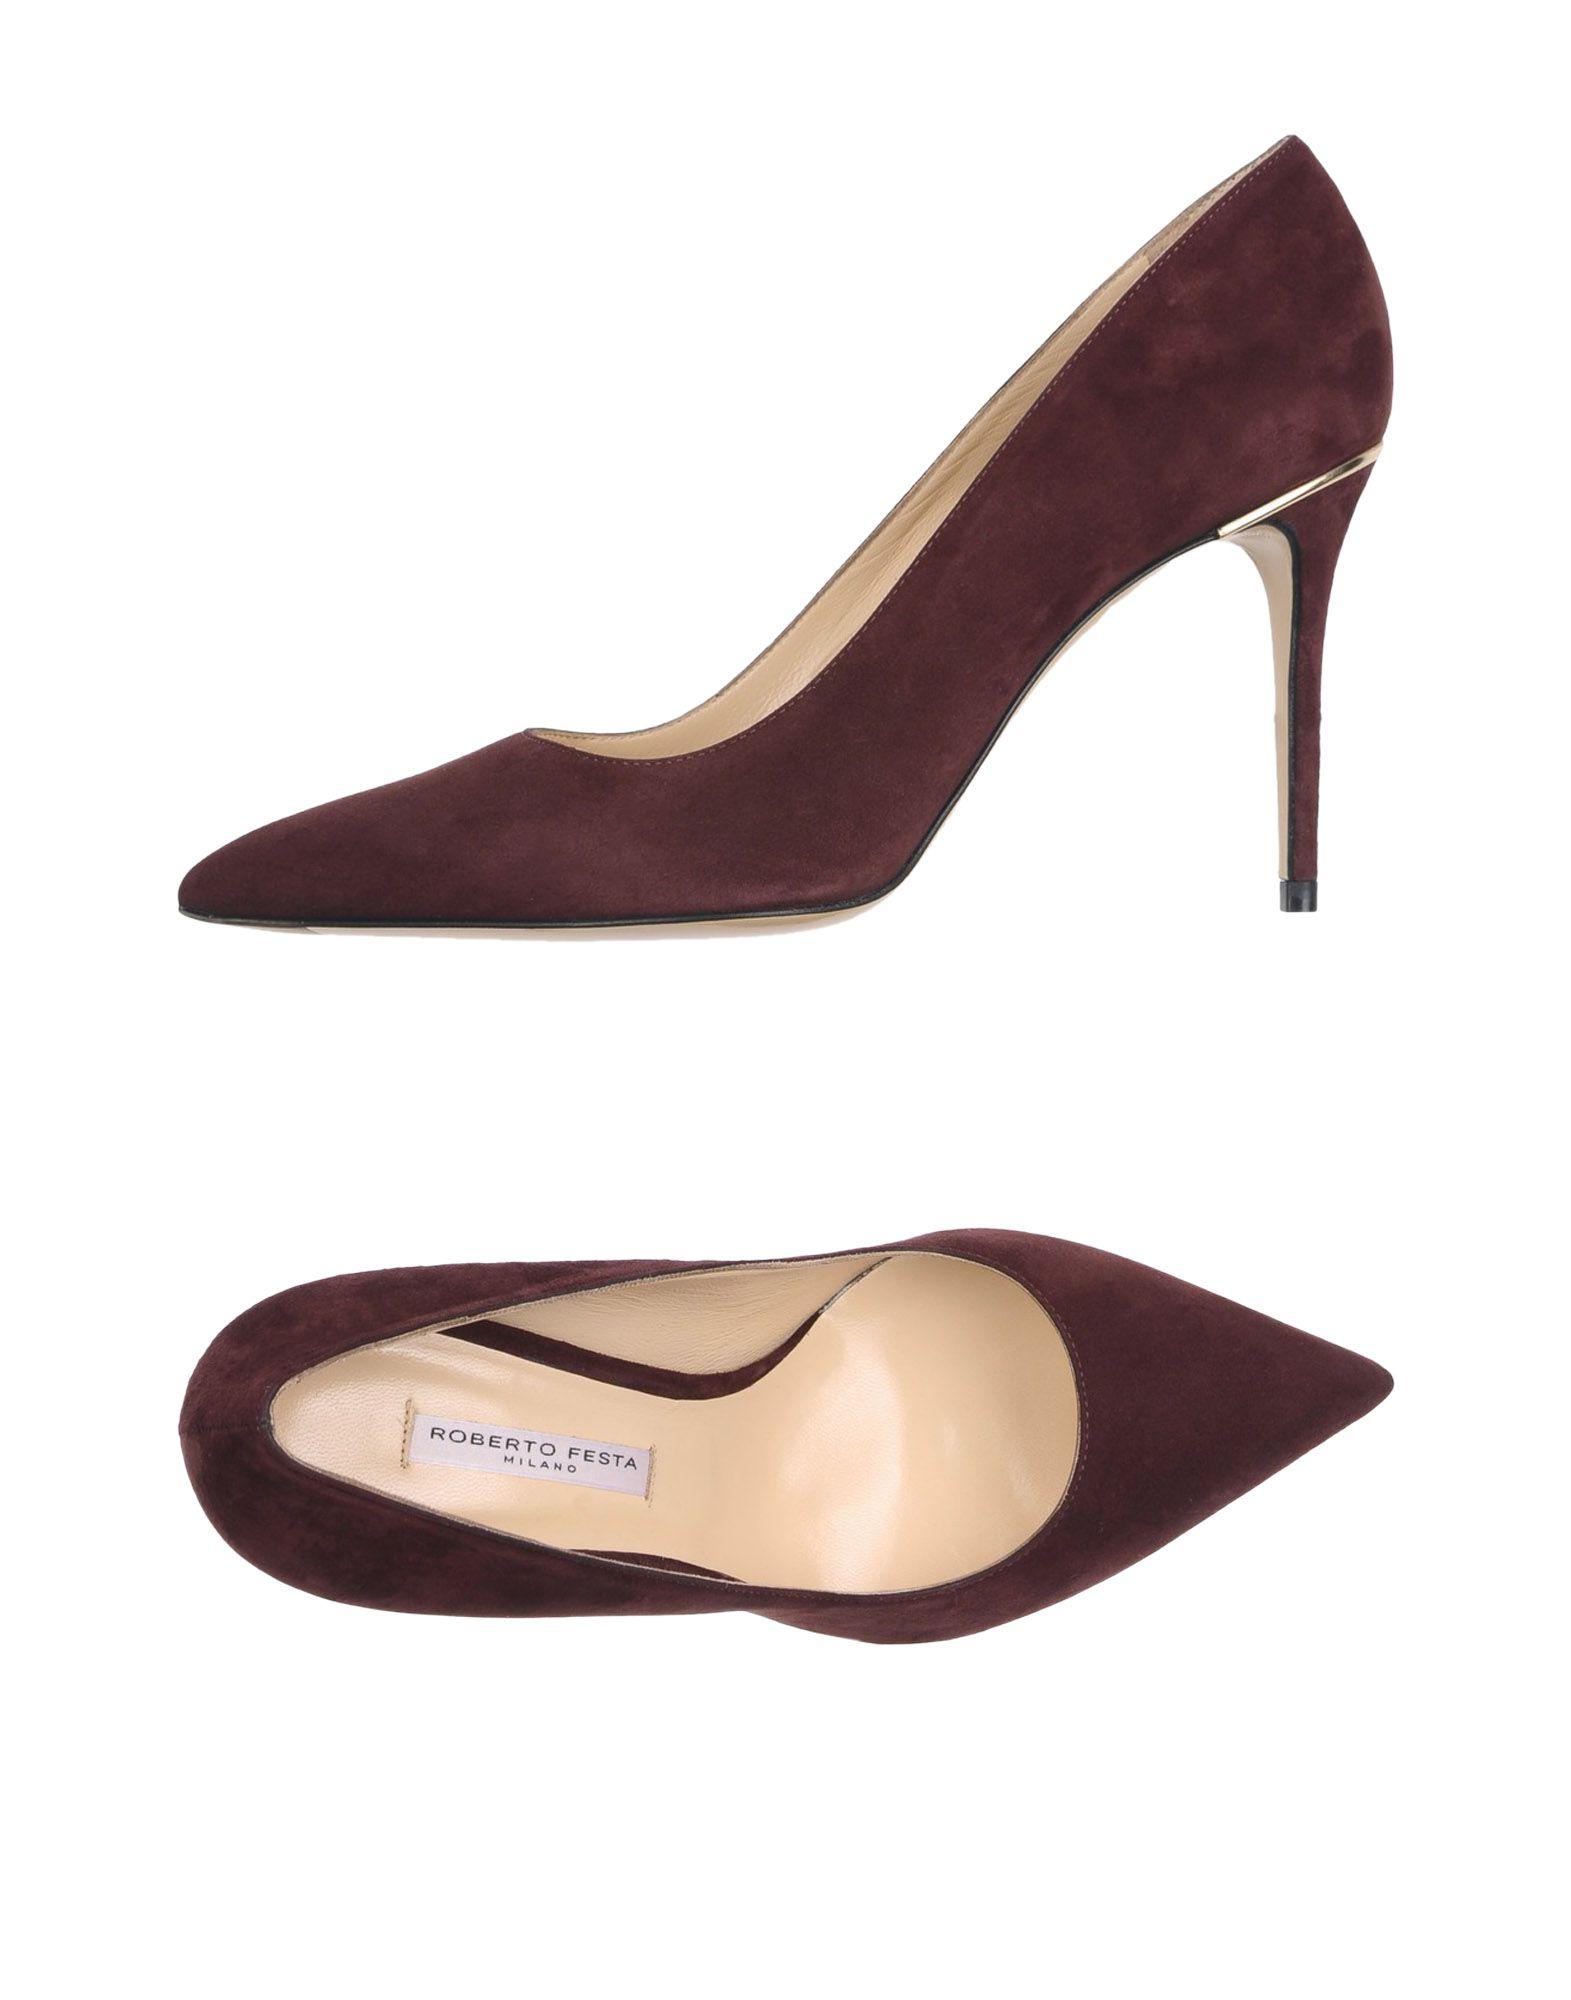 Stilvolle Pumps billige Schuhe Roberto Festa Pumps Stilvolle Damen  11240913XQ d41147